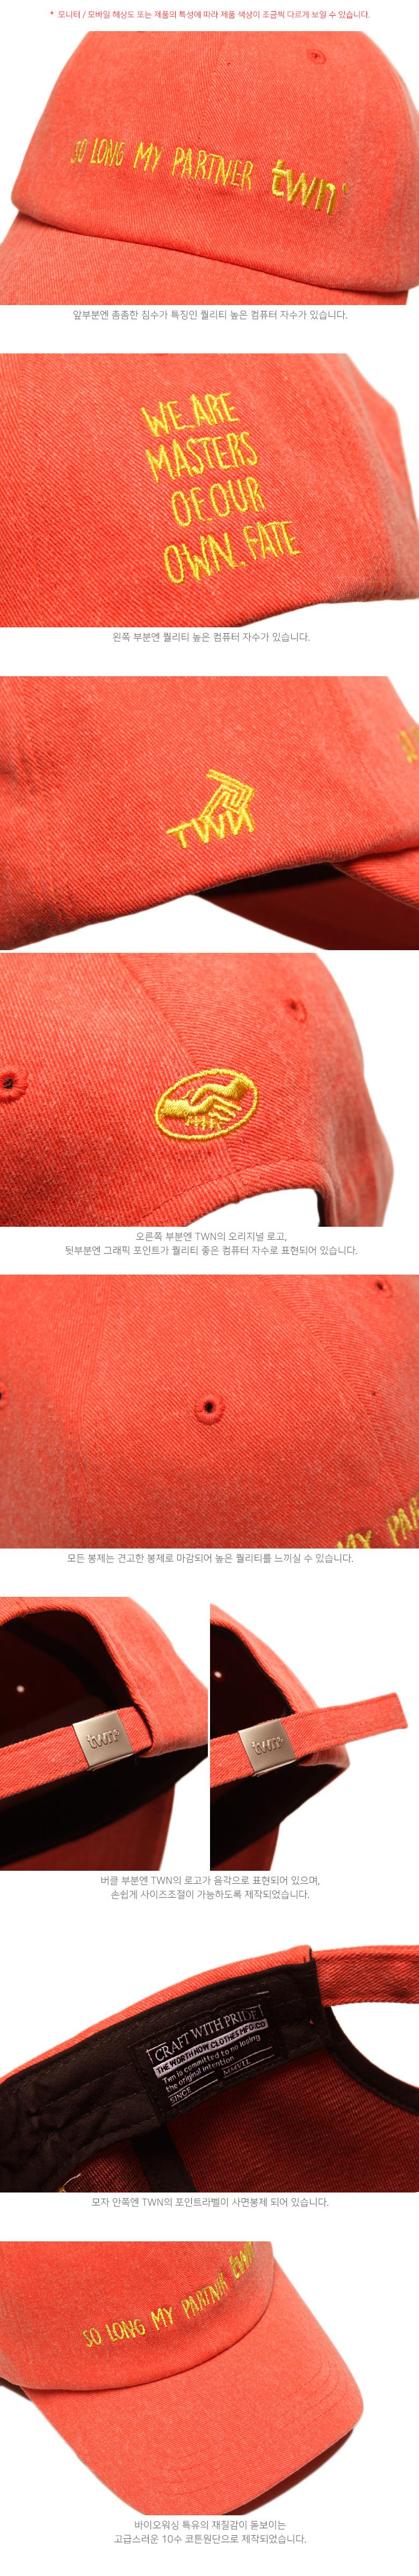 20190121_twn_partnerbio_detail_orange_ym_02.jpg